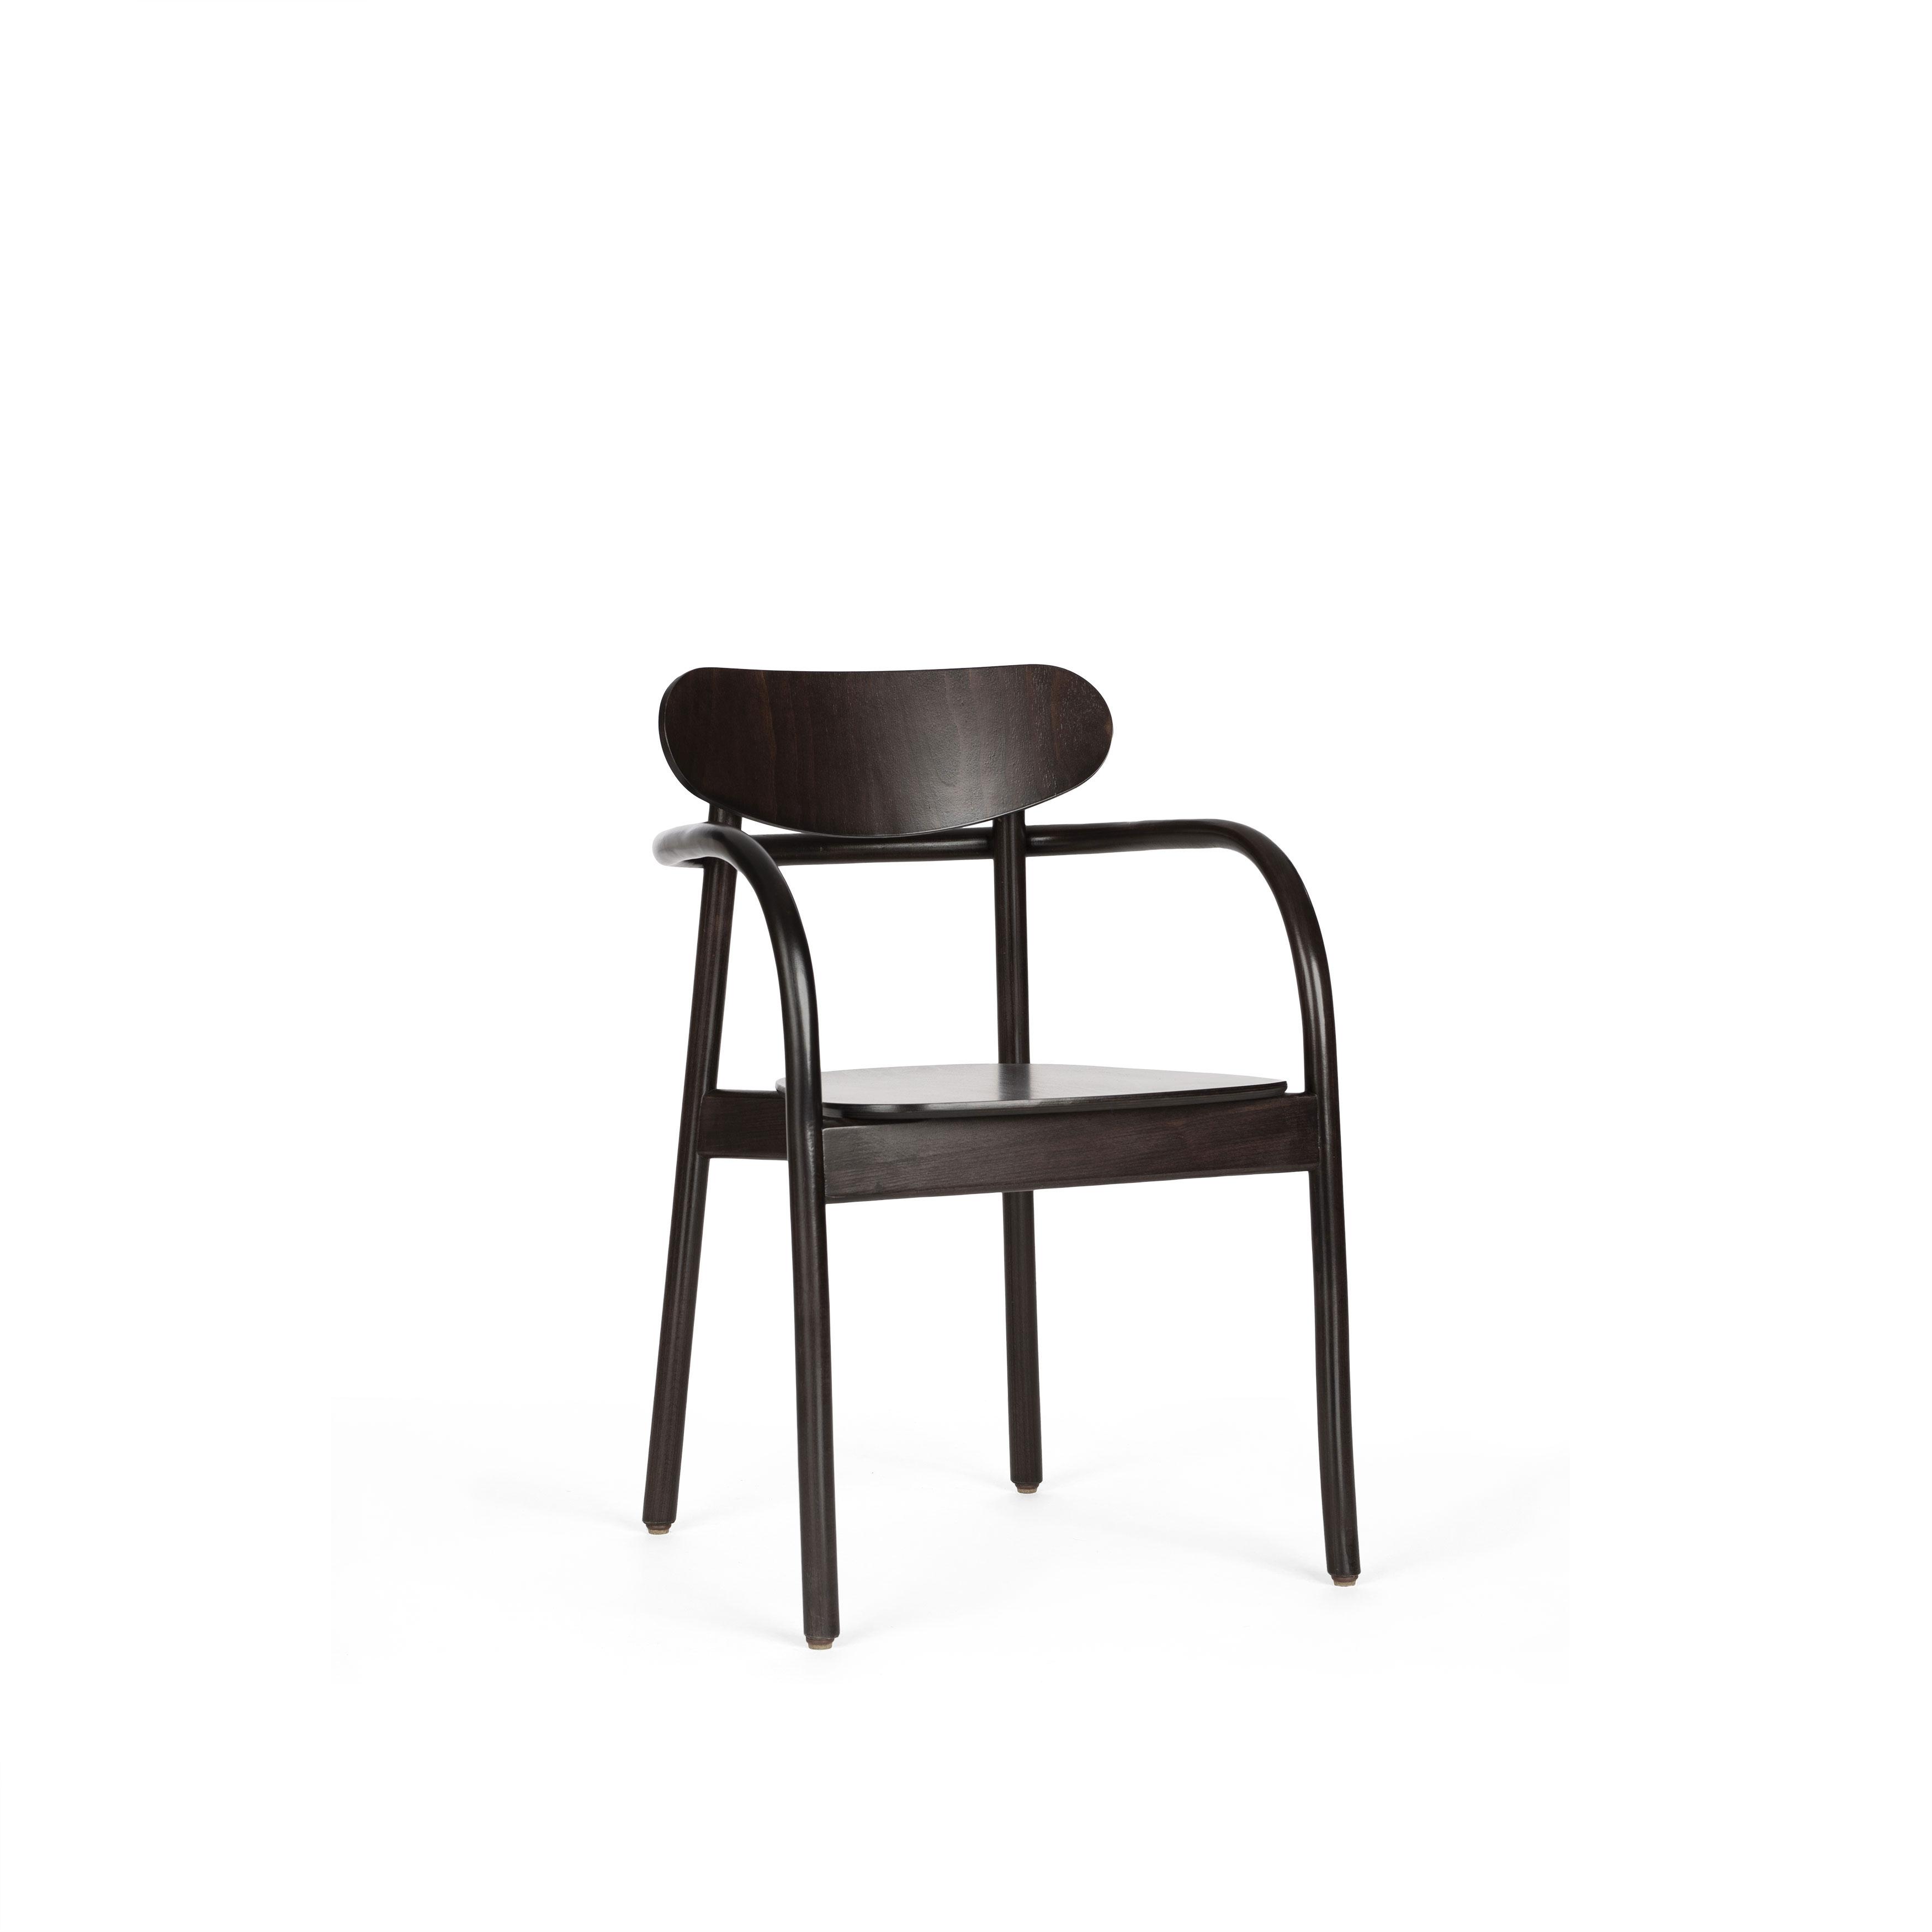 Paged krzesło LA BENDA B-2960